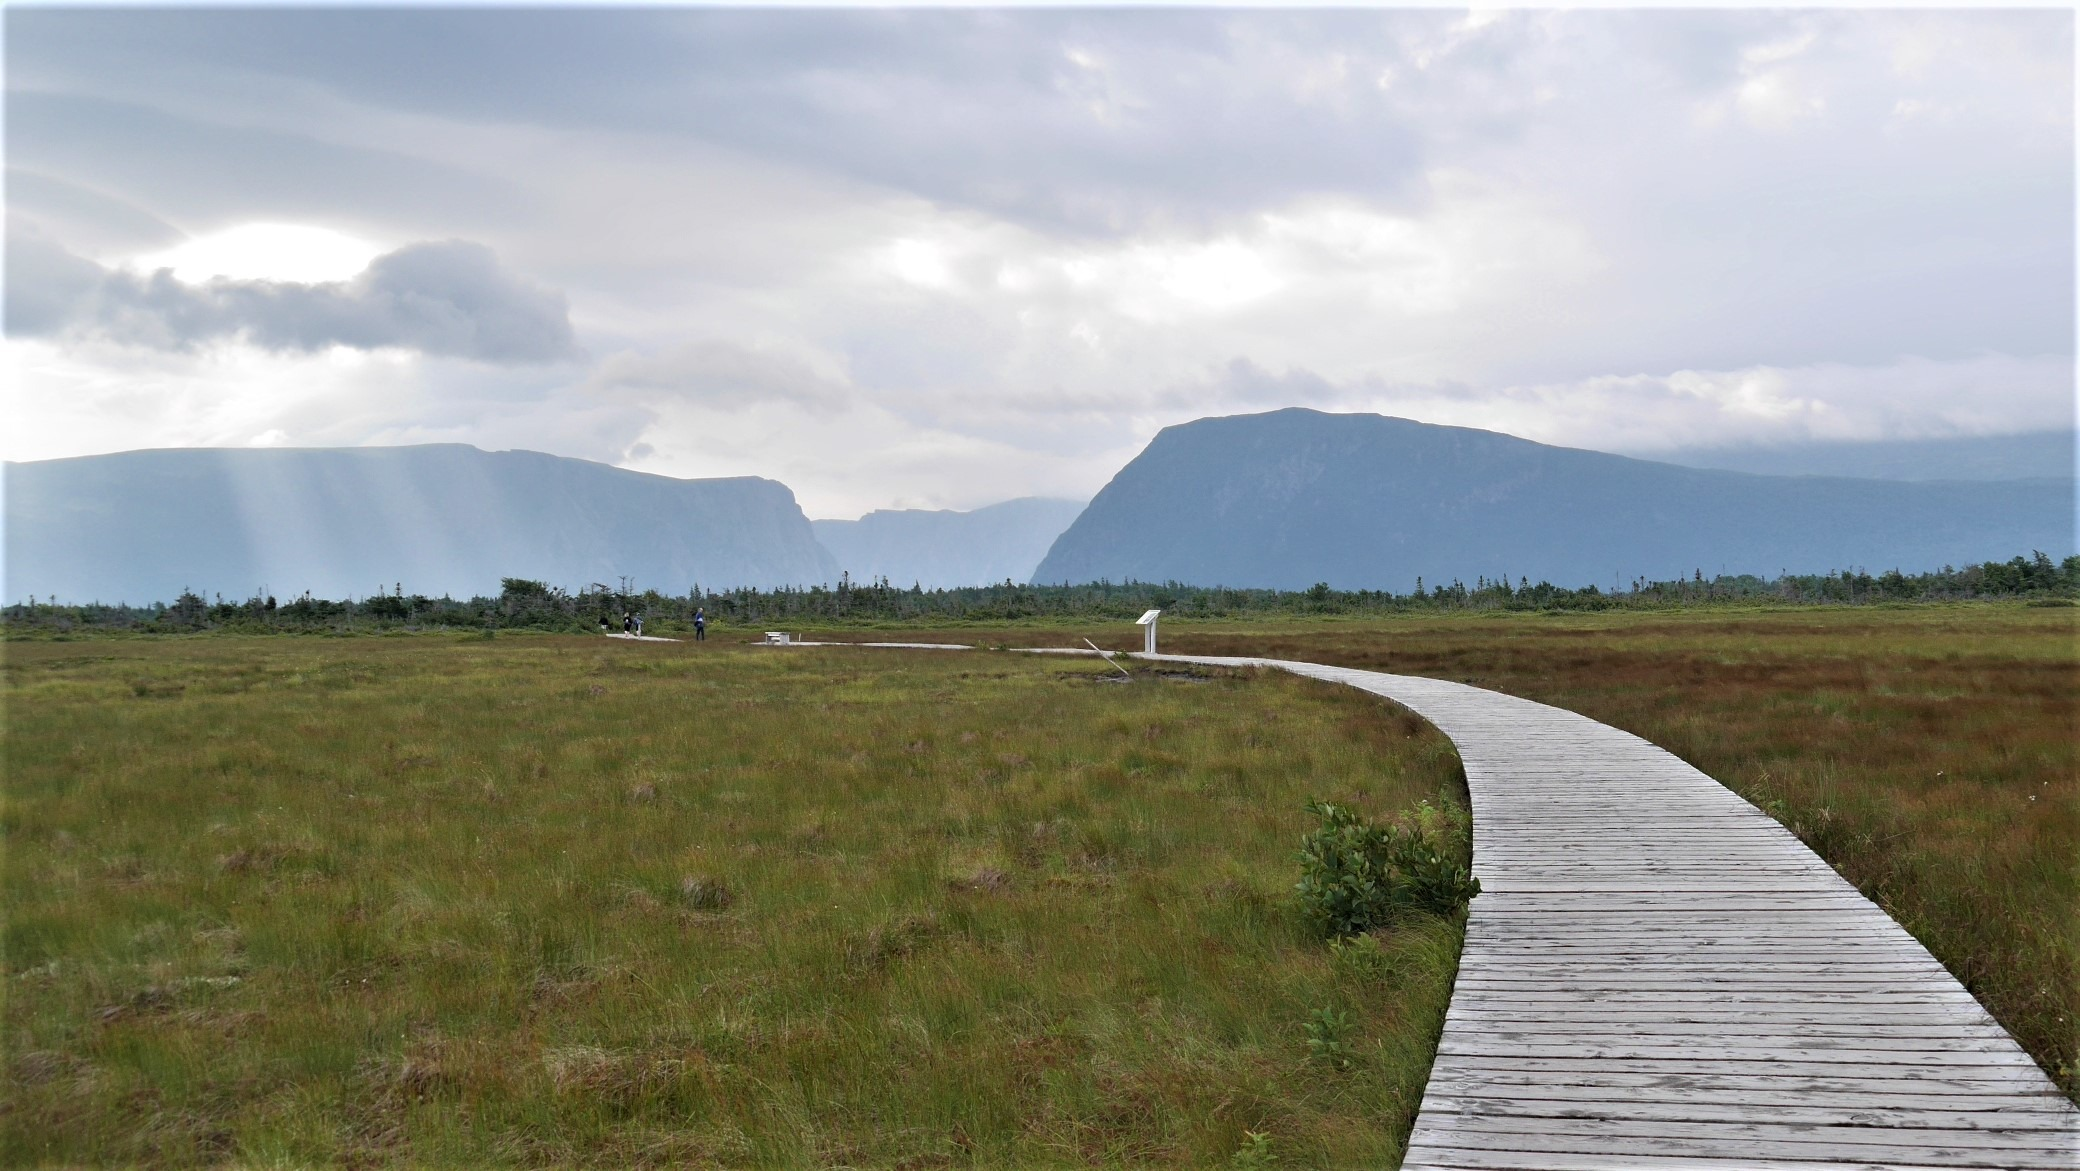 Terre-Neuve croisière étang Western Brook Pond Canada voyage road-trip